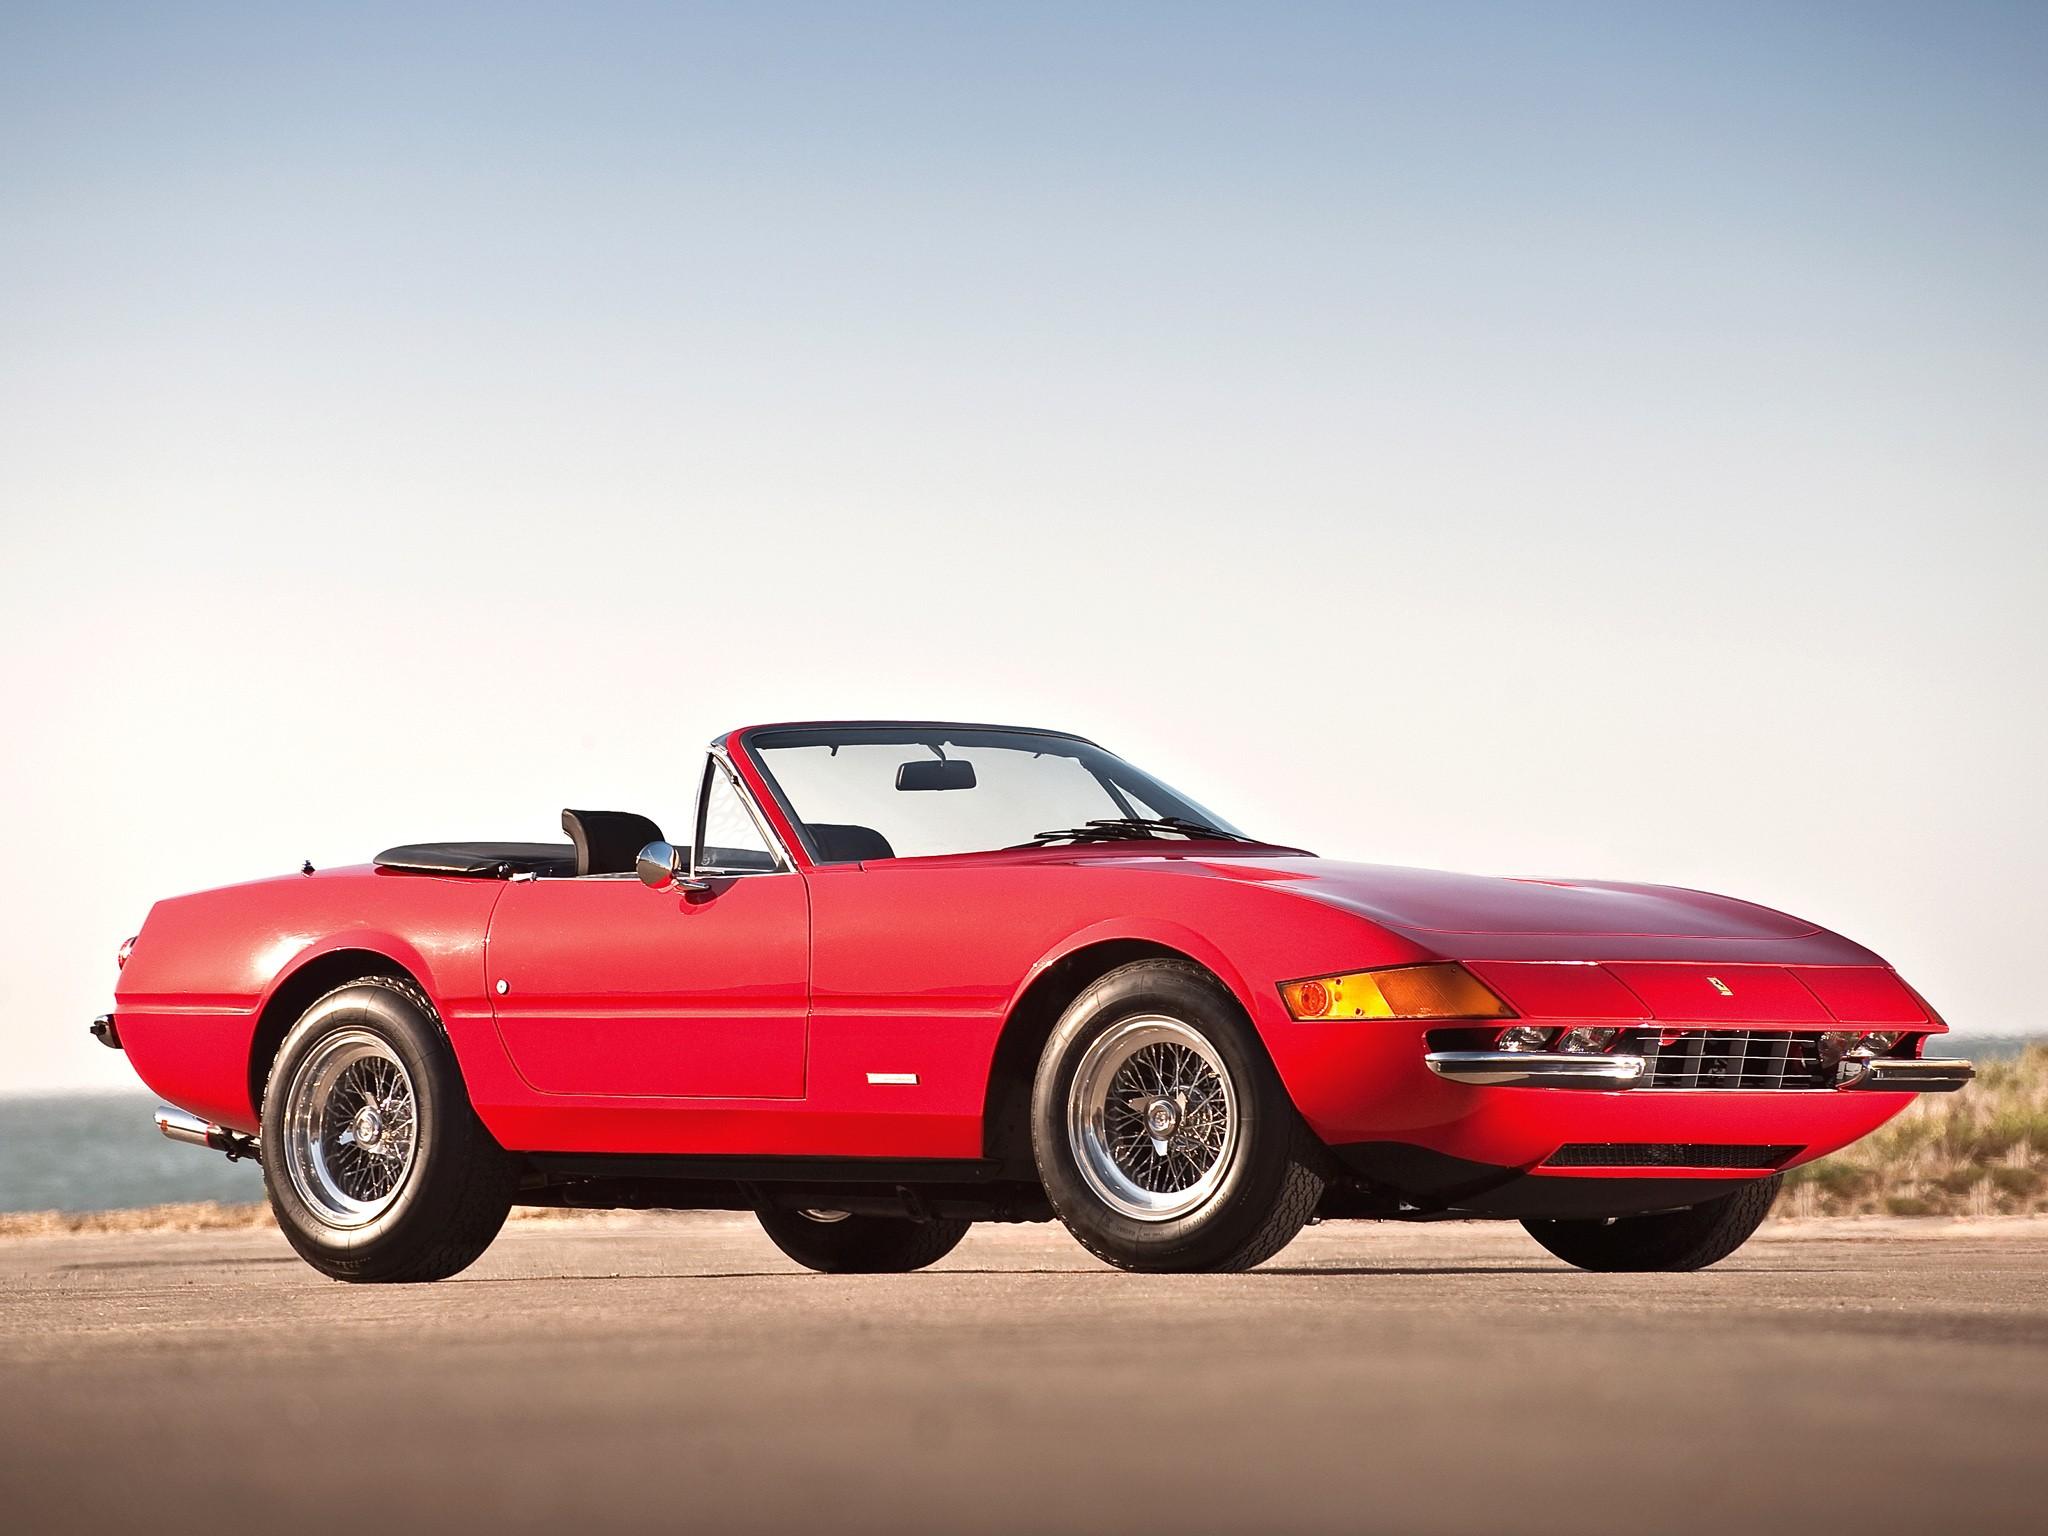 Ferrari 365 Gts 4 Specs 1969 1970 1971 1972 1973 1974